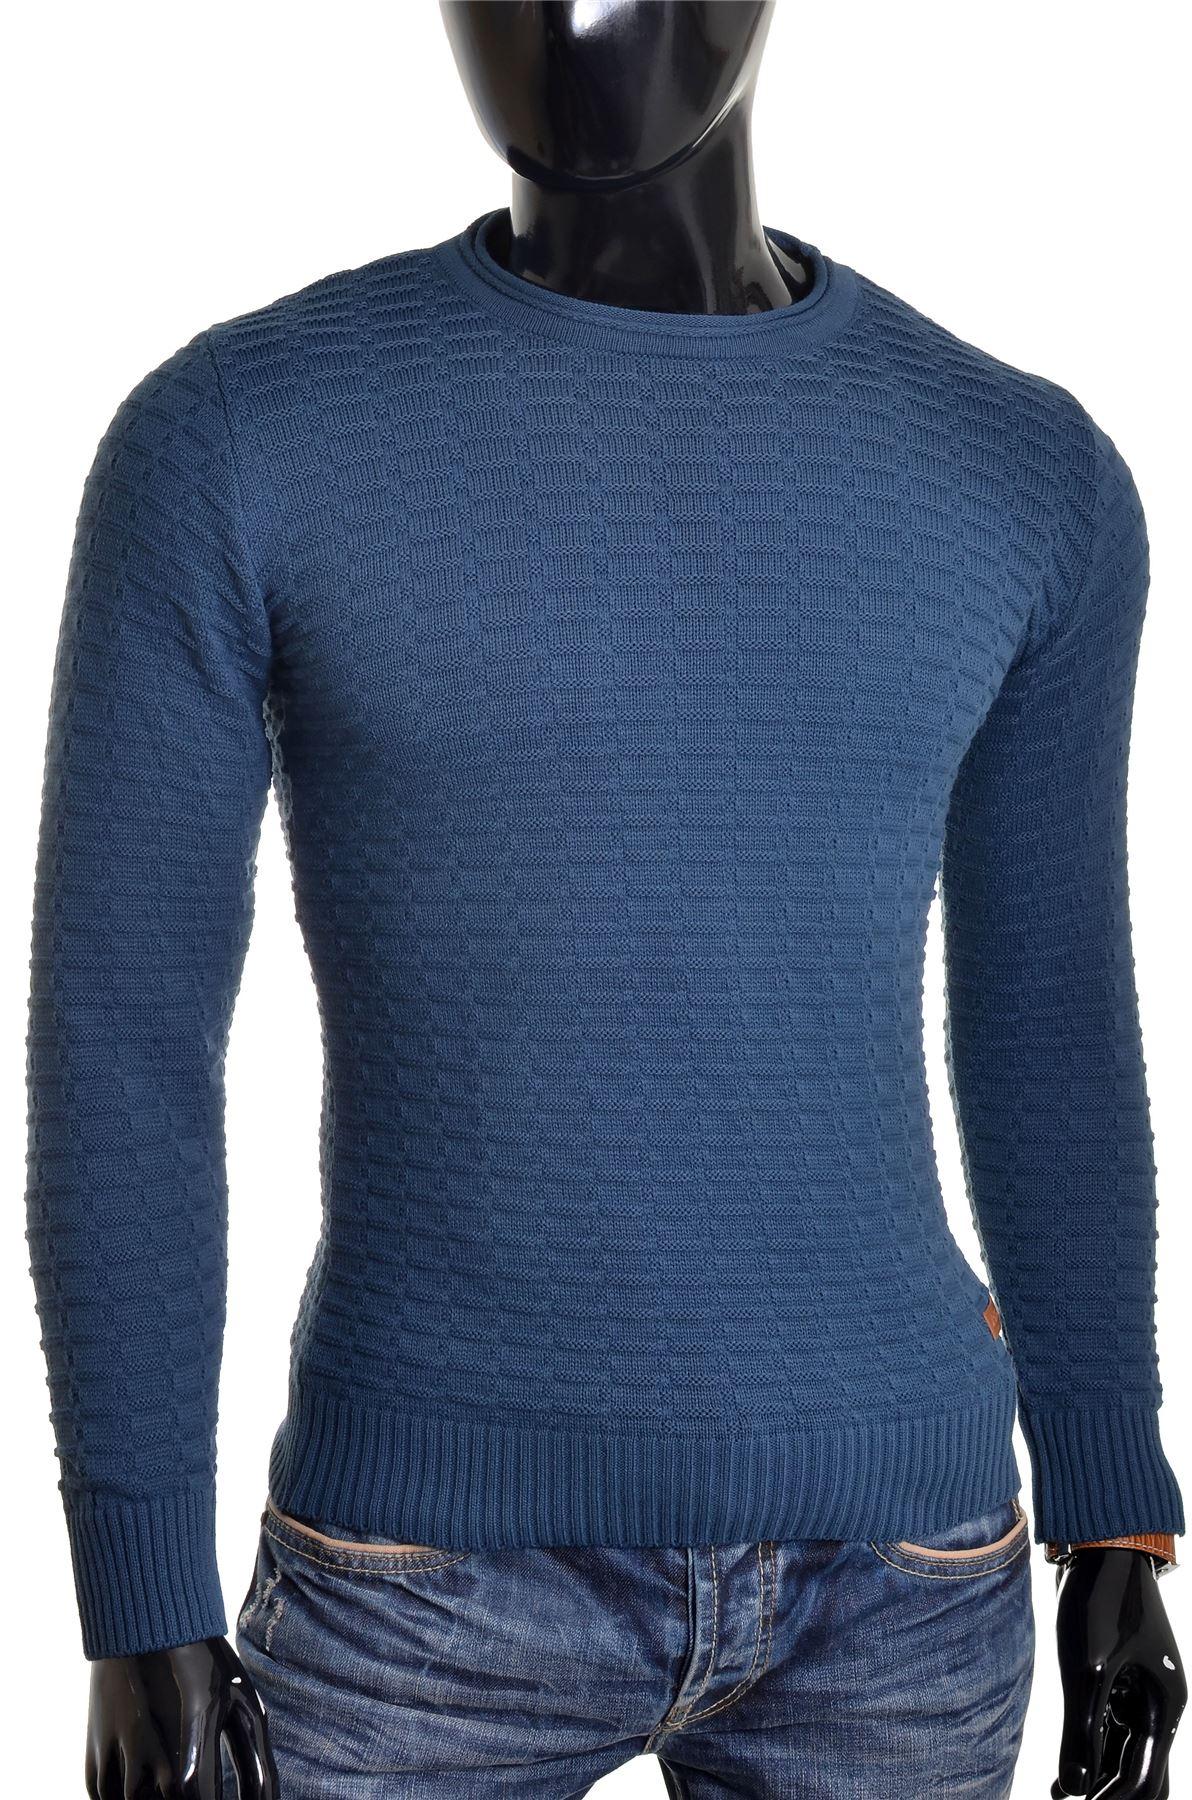 Men-039-s-Jumper-Striped-Knit-Smart-Long-Sleeve-Sweater-Crew-Neck-Top-Slim-Fitness thumbnail 18